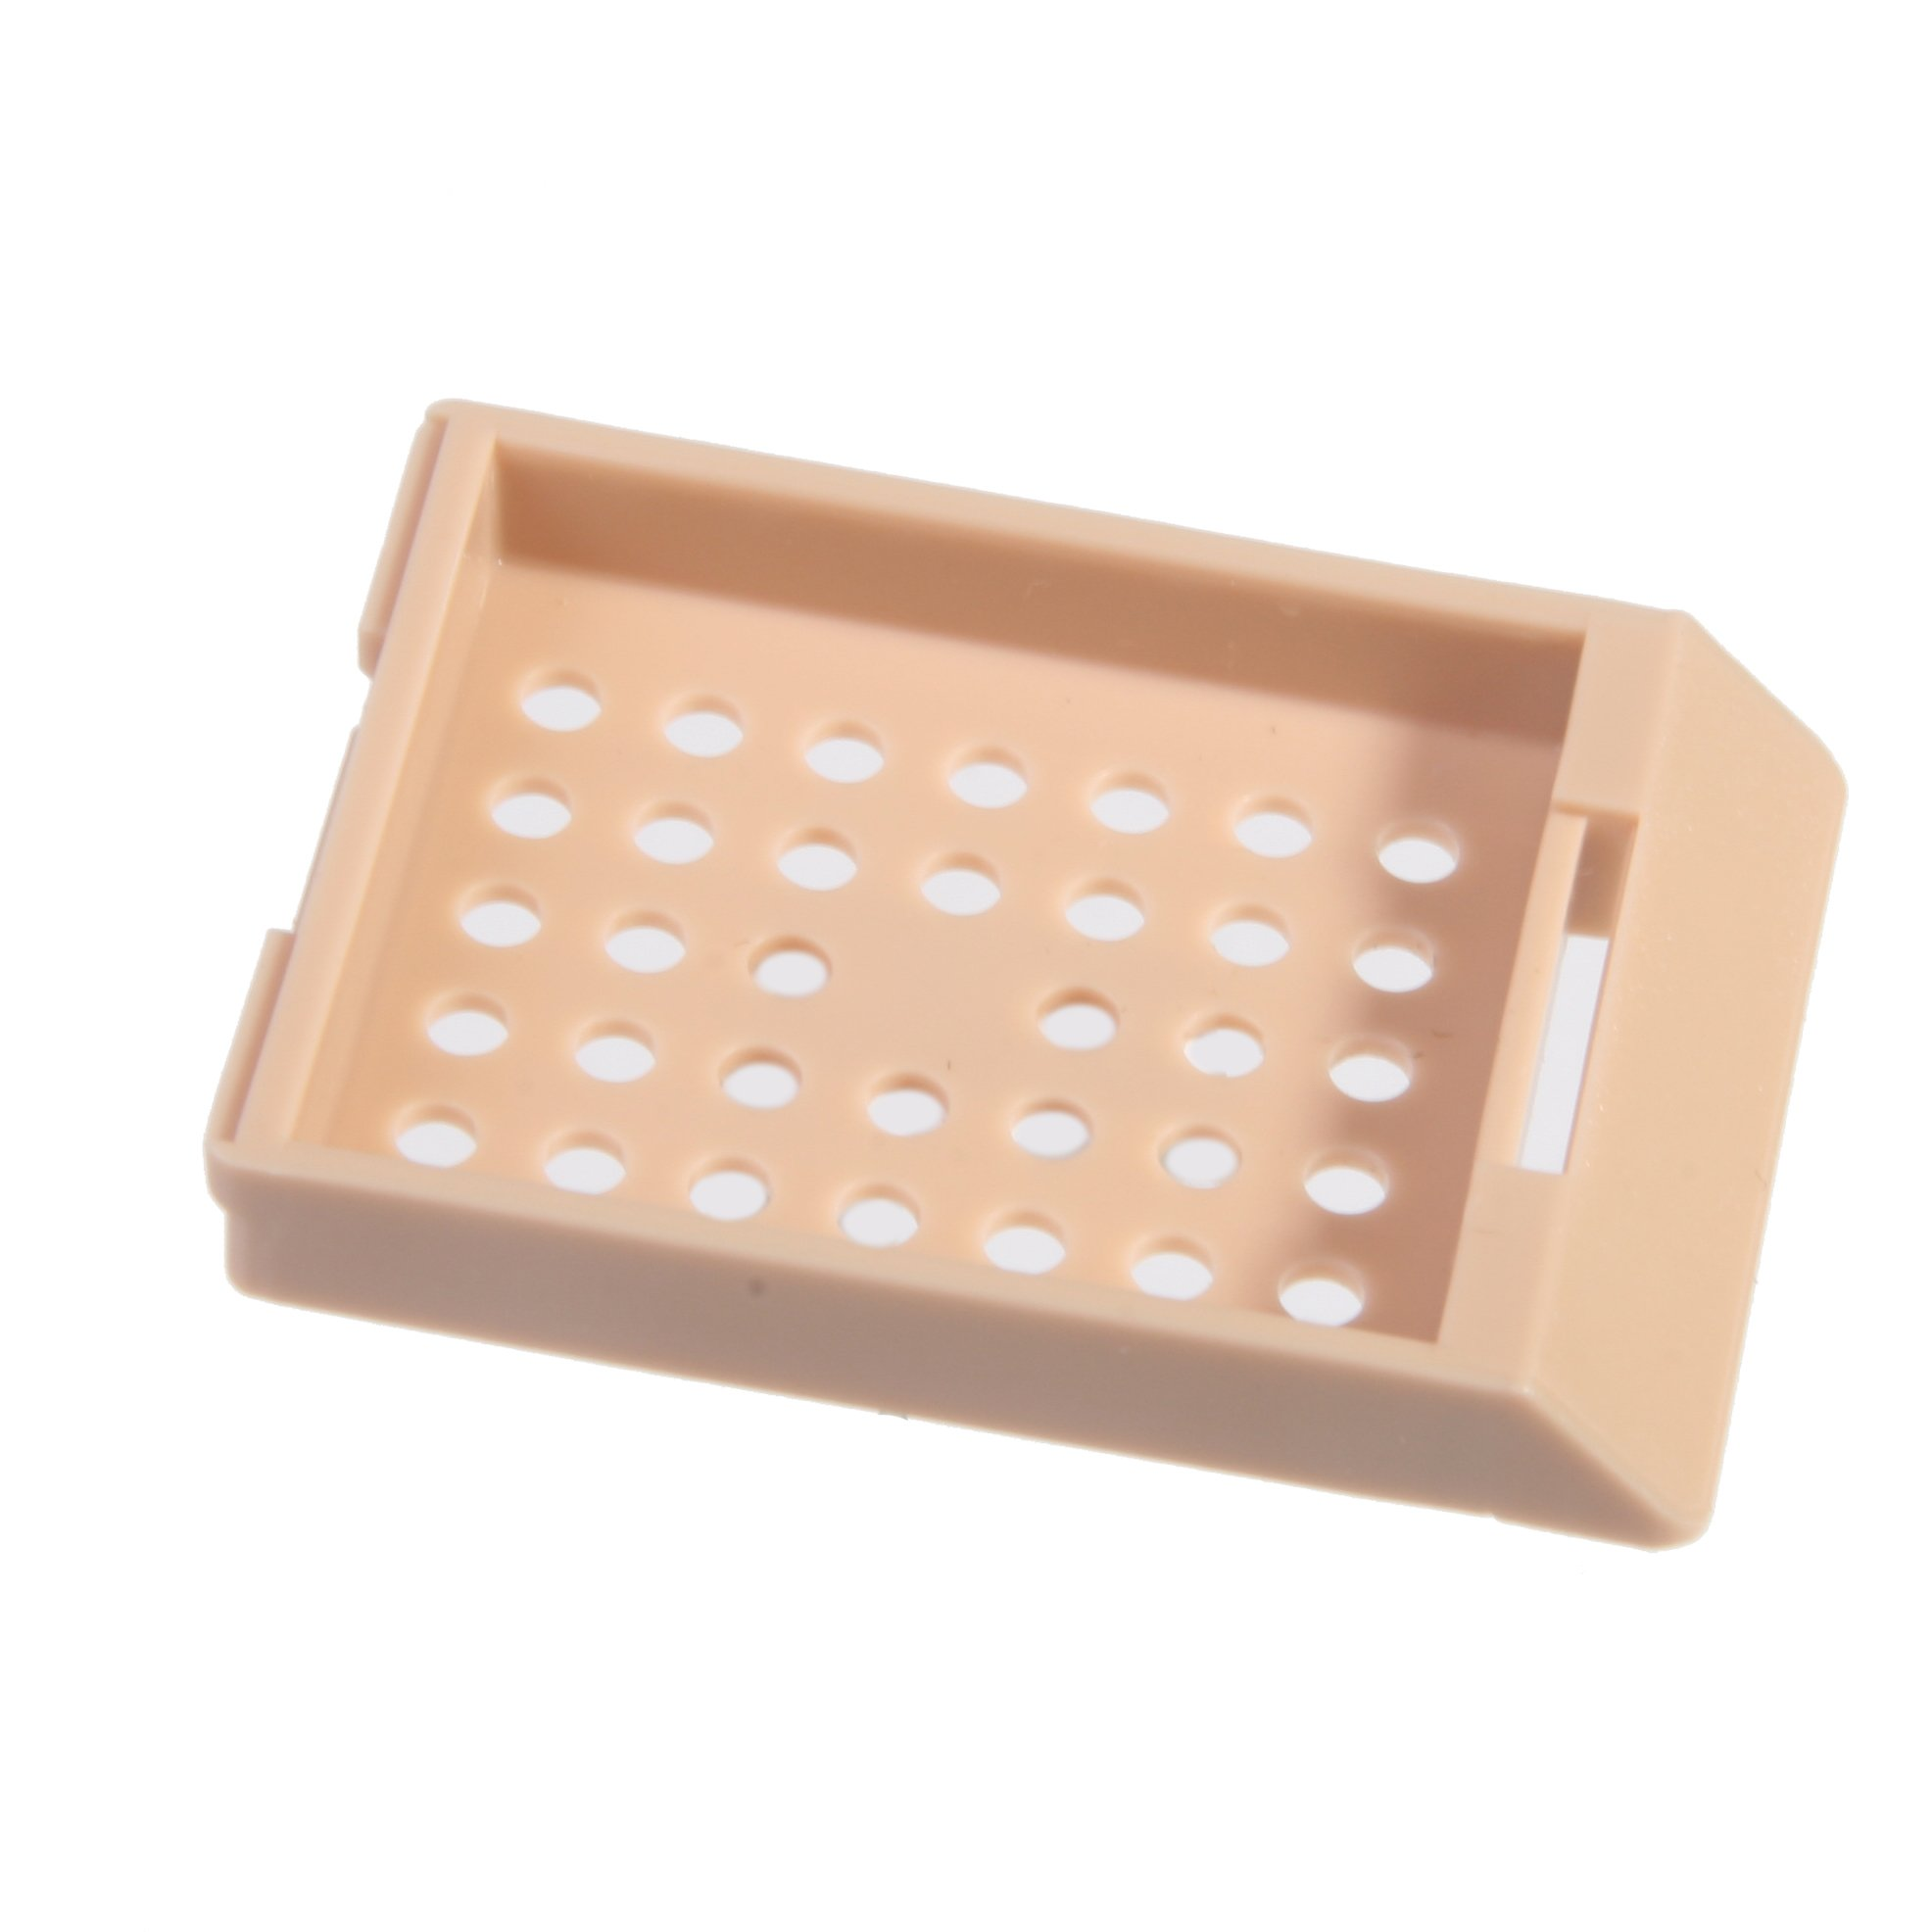 Bio Plas 6035 Tan Acetyl Plastic Histo Plas Capsette Tissue Embedding Cassettes (Pack of 500)